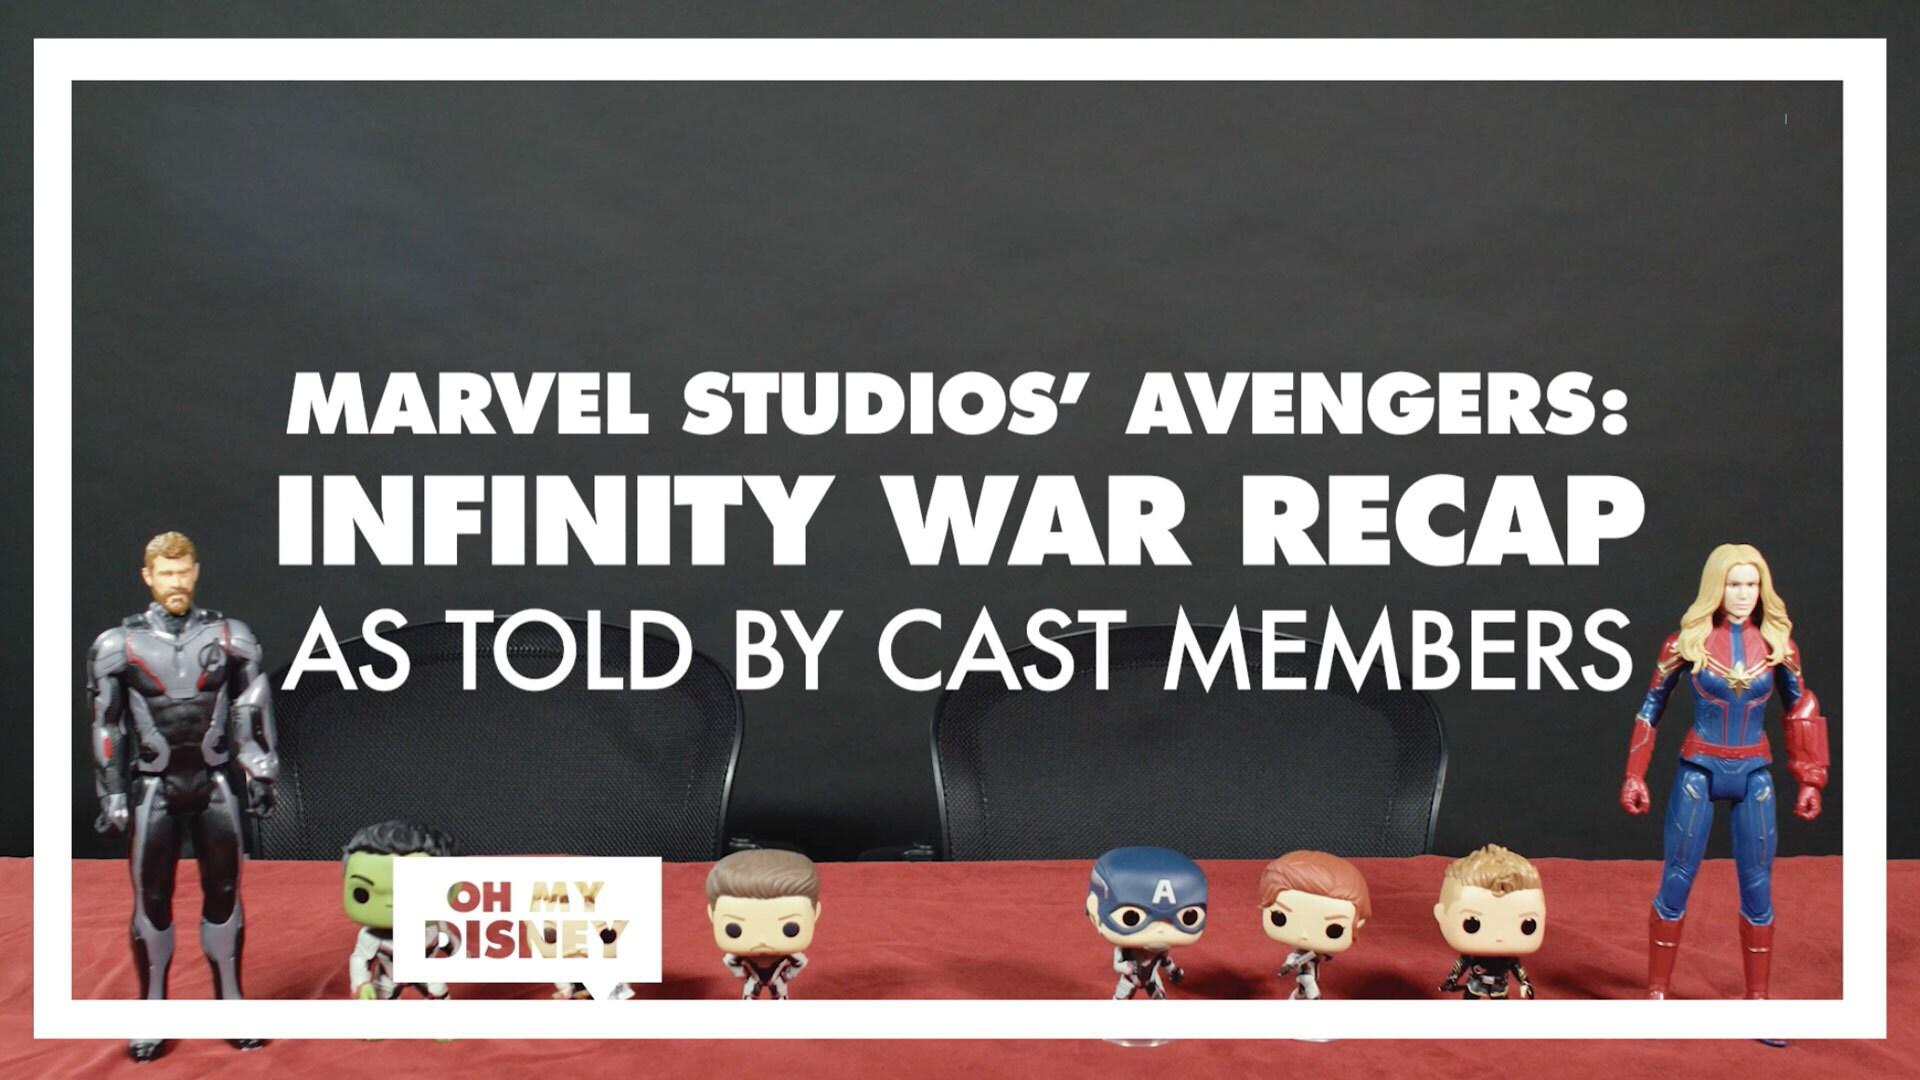 As Told By: Cast Members Recap Marvel Studios' Avengers: Infinity War